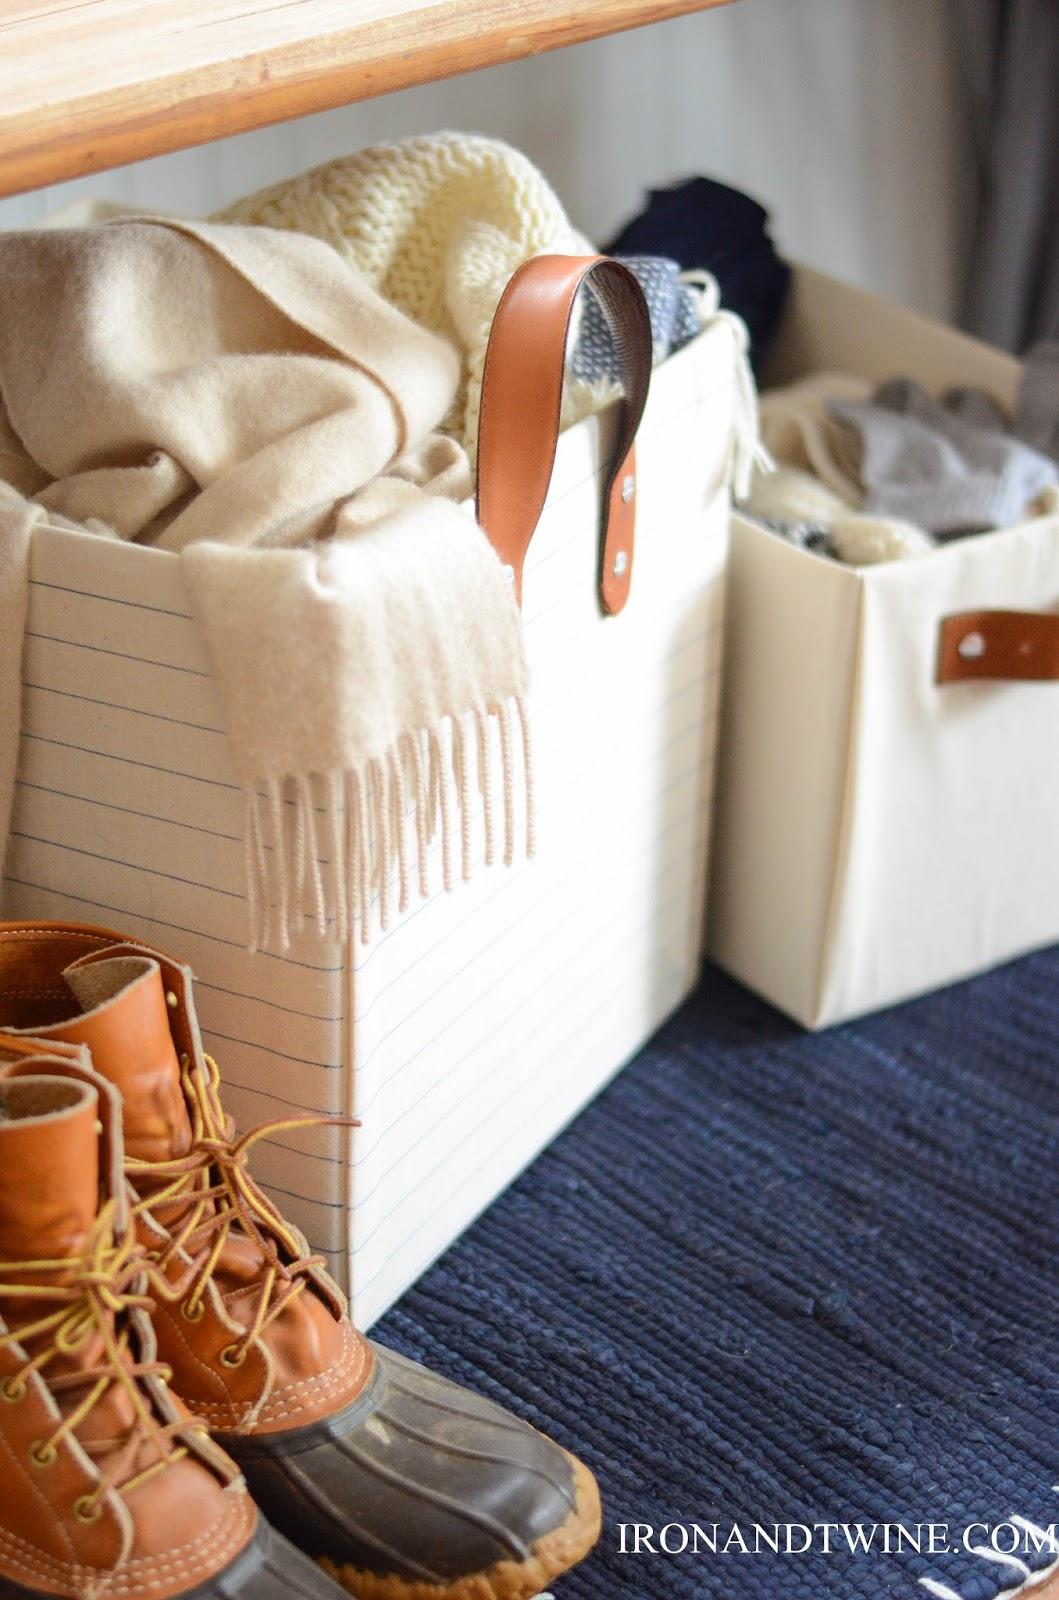 DIY+Belt+Handled+Box,+DIY+fabric+covered+box,+Iron+and+Twine+(2).jpg